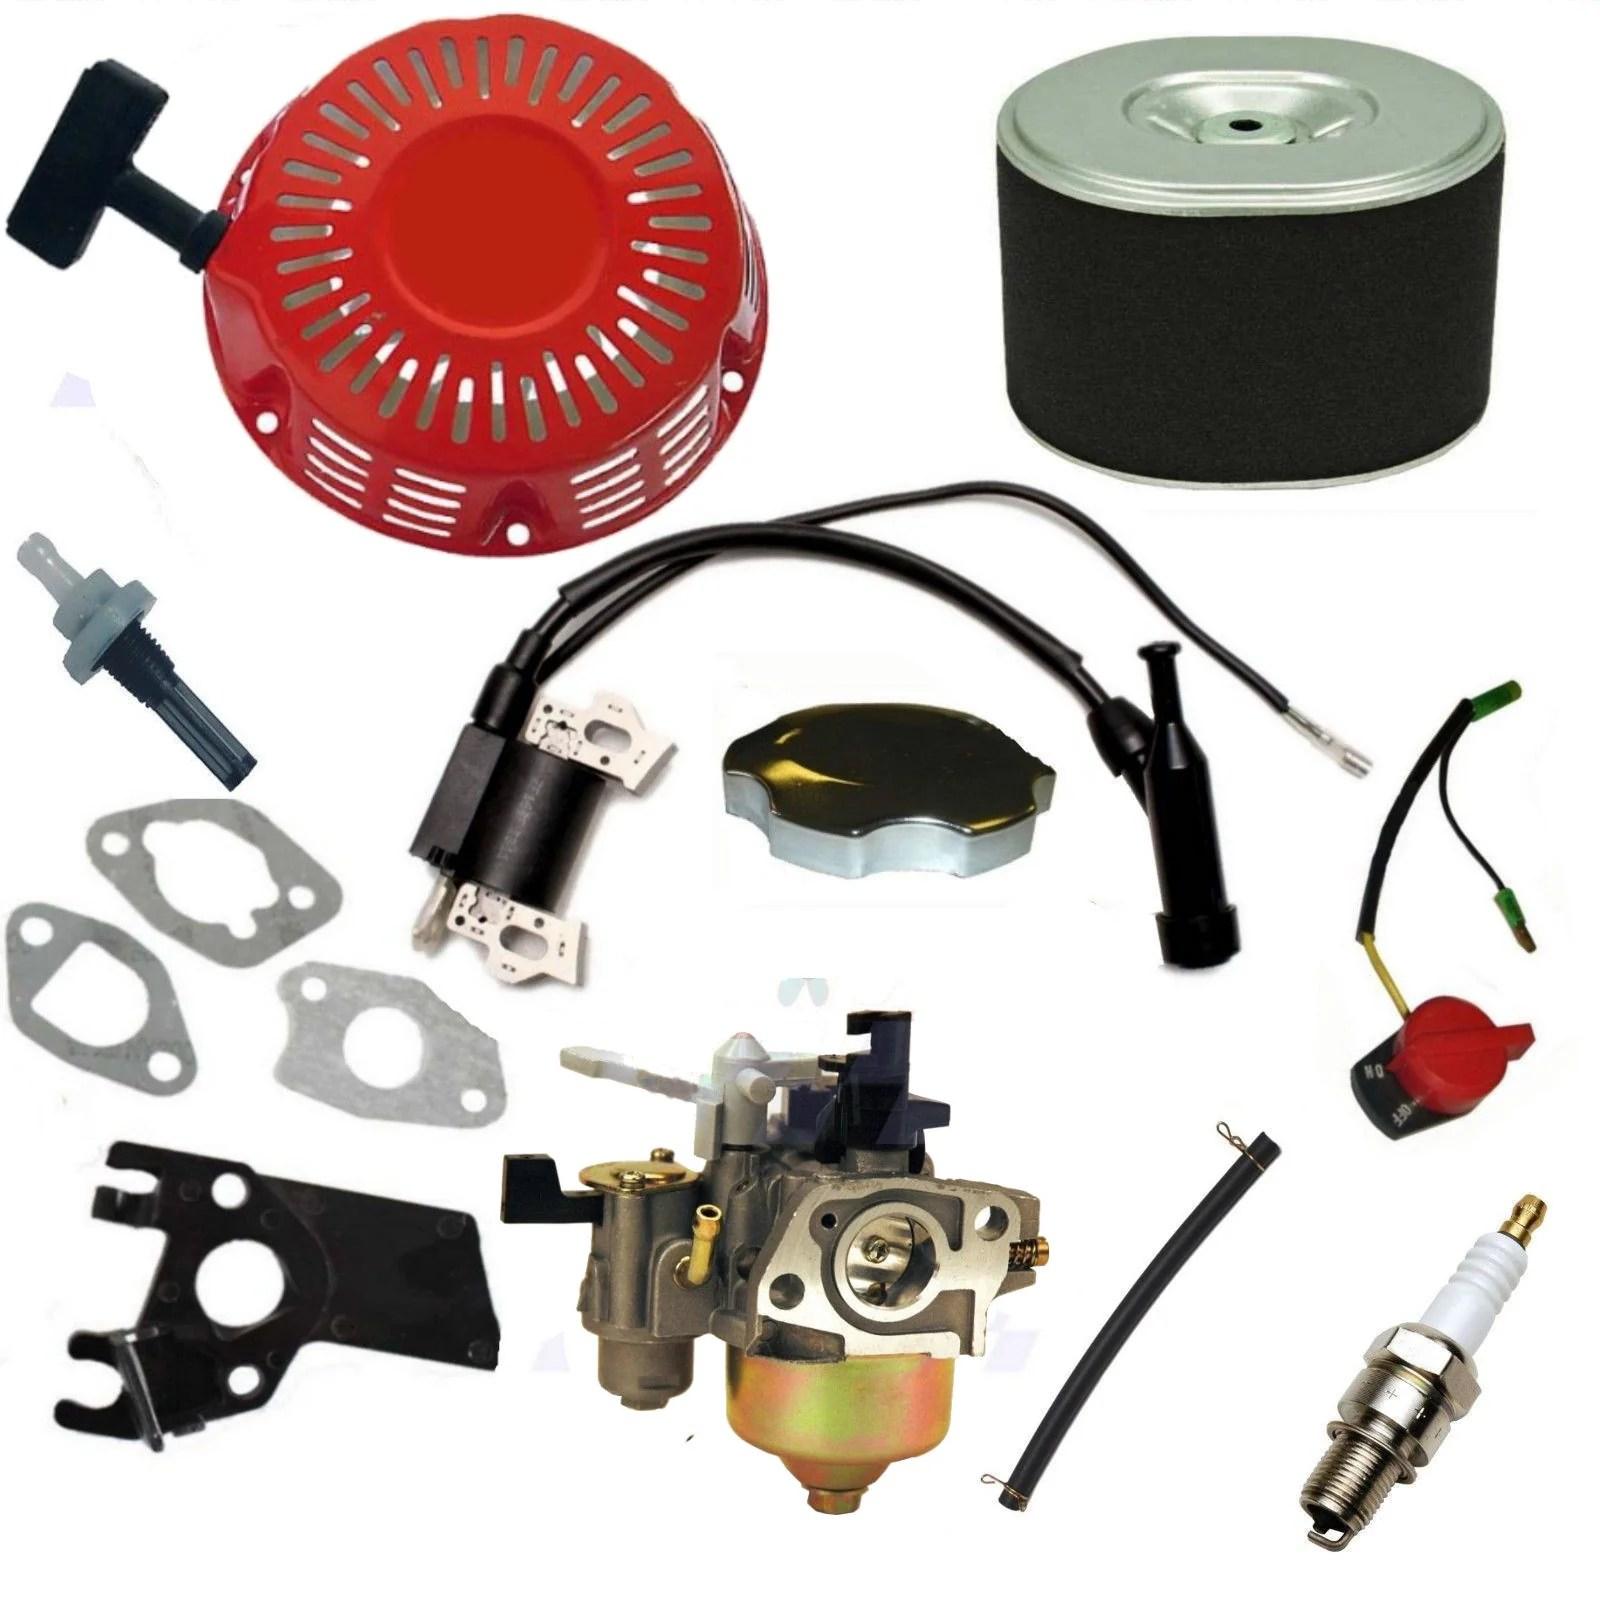 small resolution of new honda gx390 recoil carburetor ignition coil spark plug air honda gx390 solenoid honda gx390 wiring plug